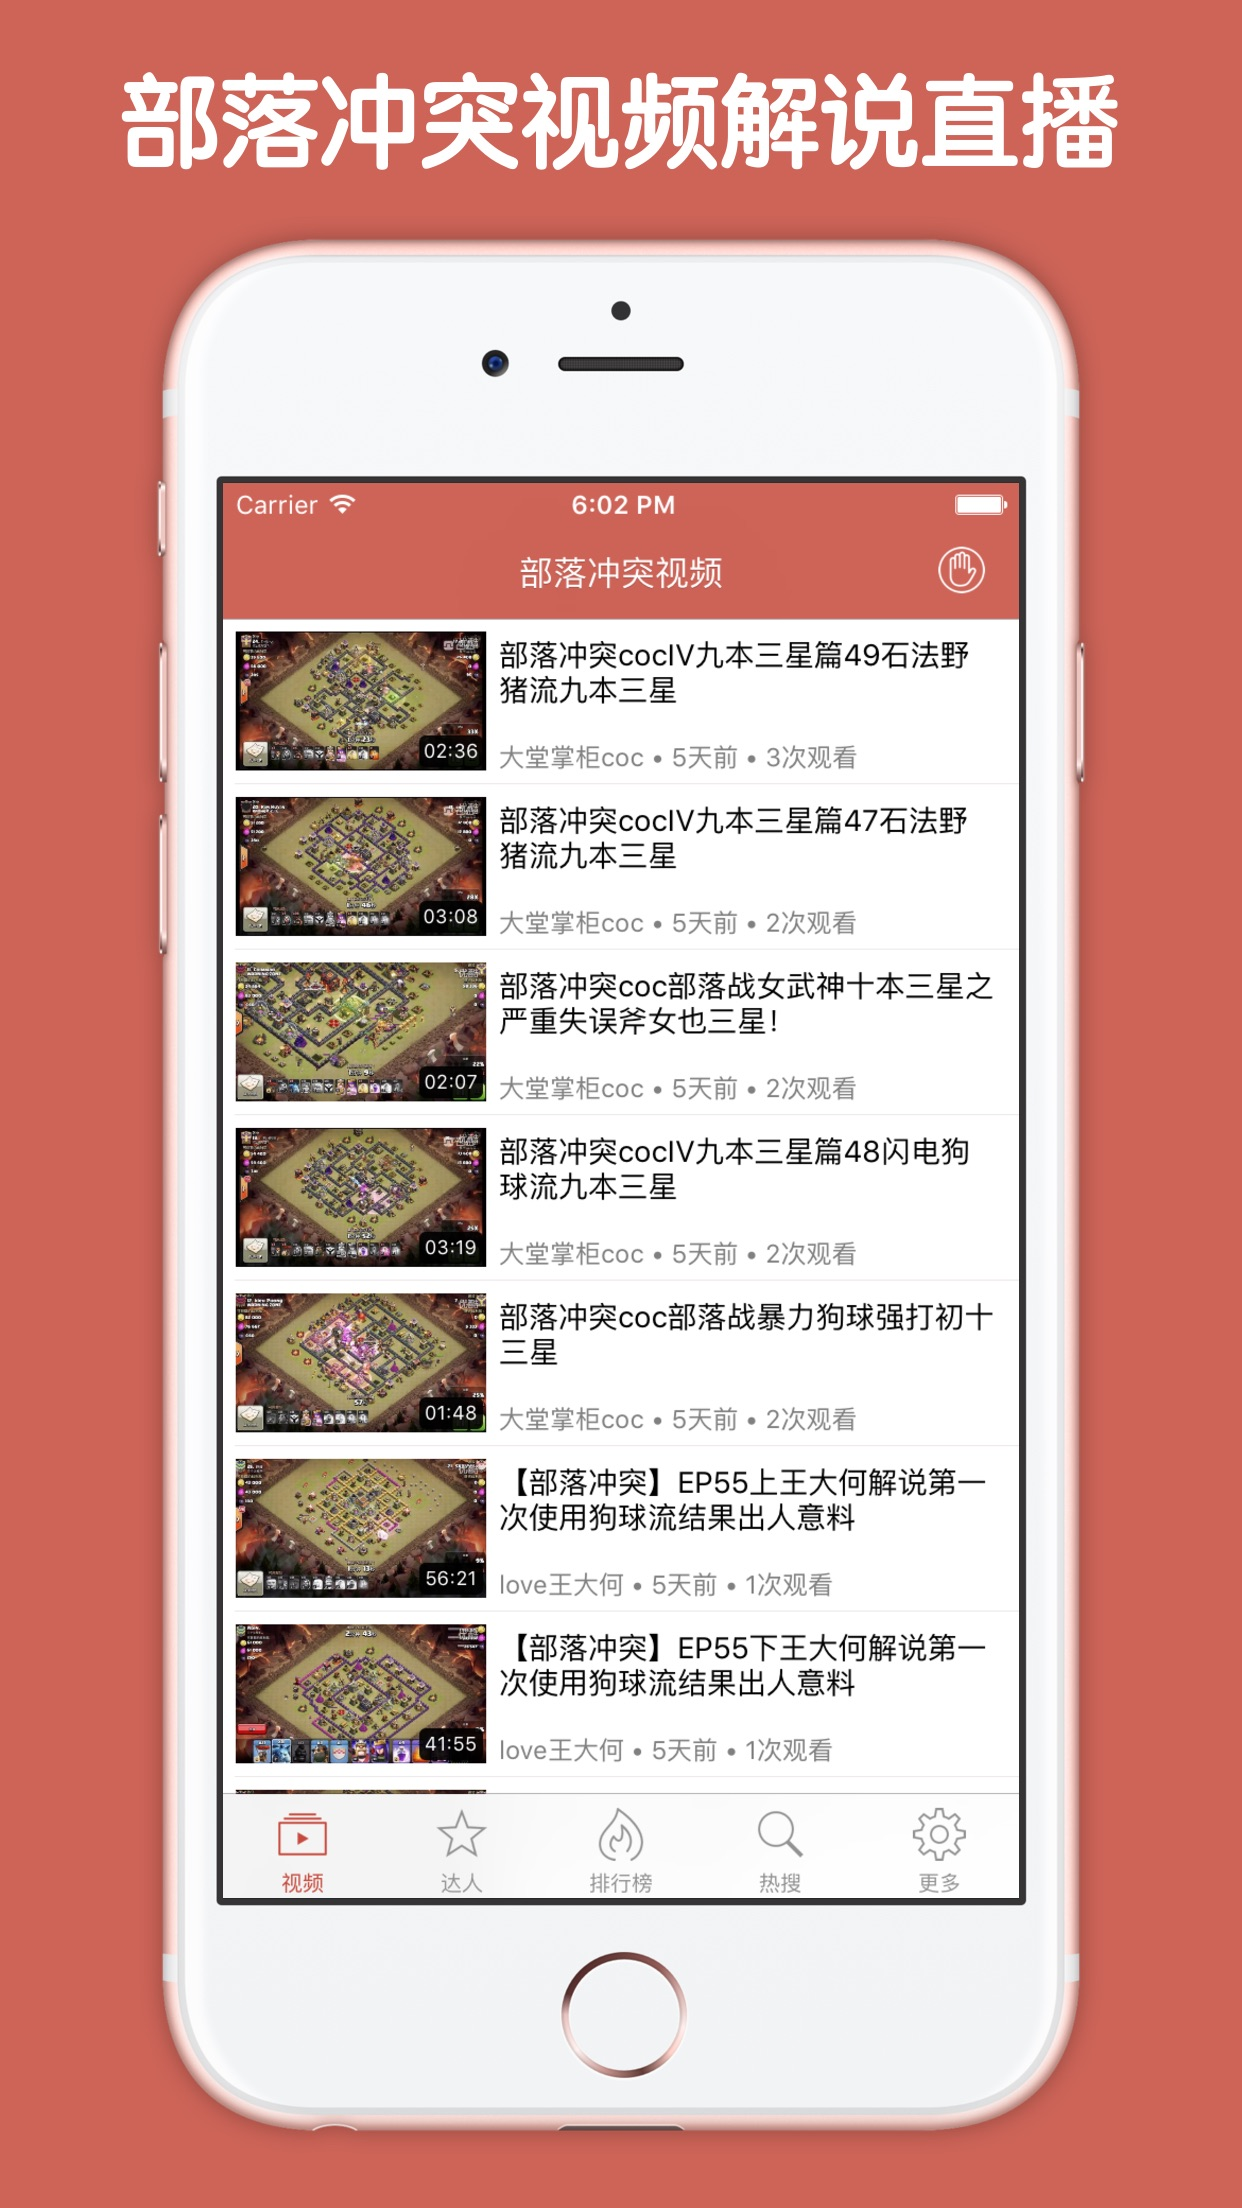 视频直播盒子 For 部落冲突 Screenshot